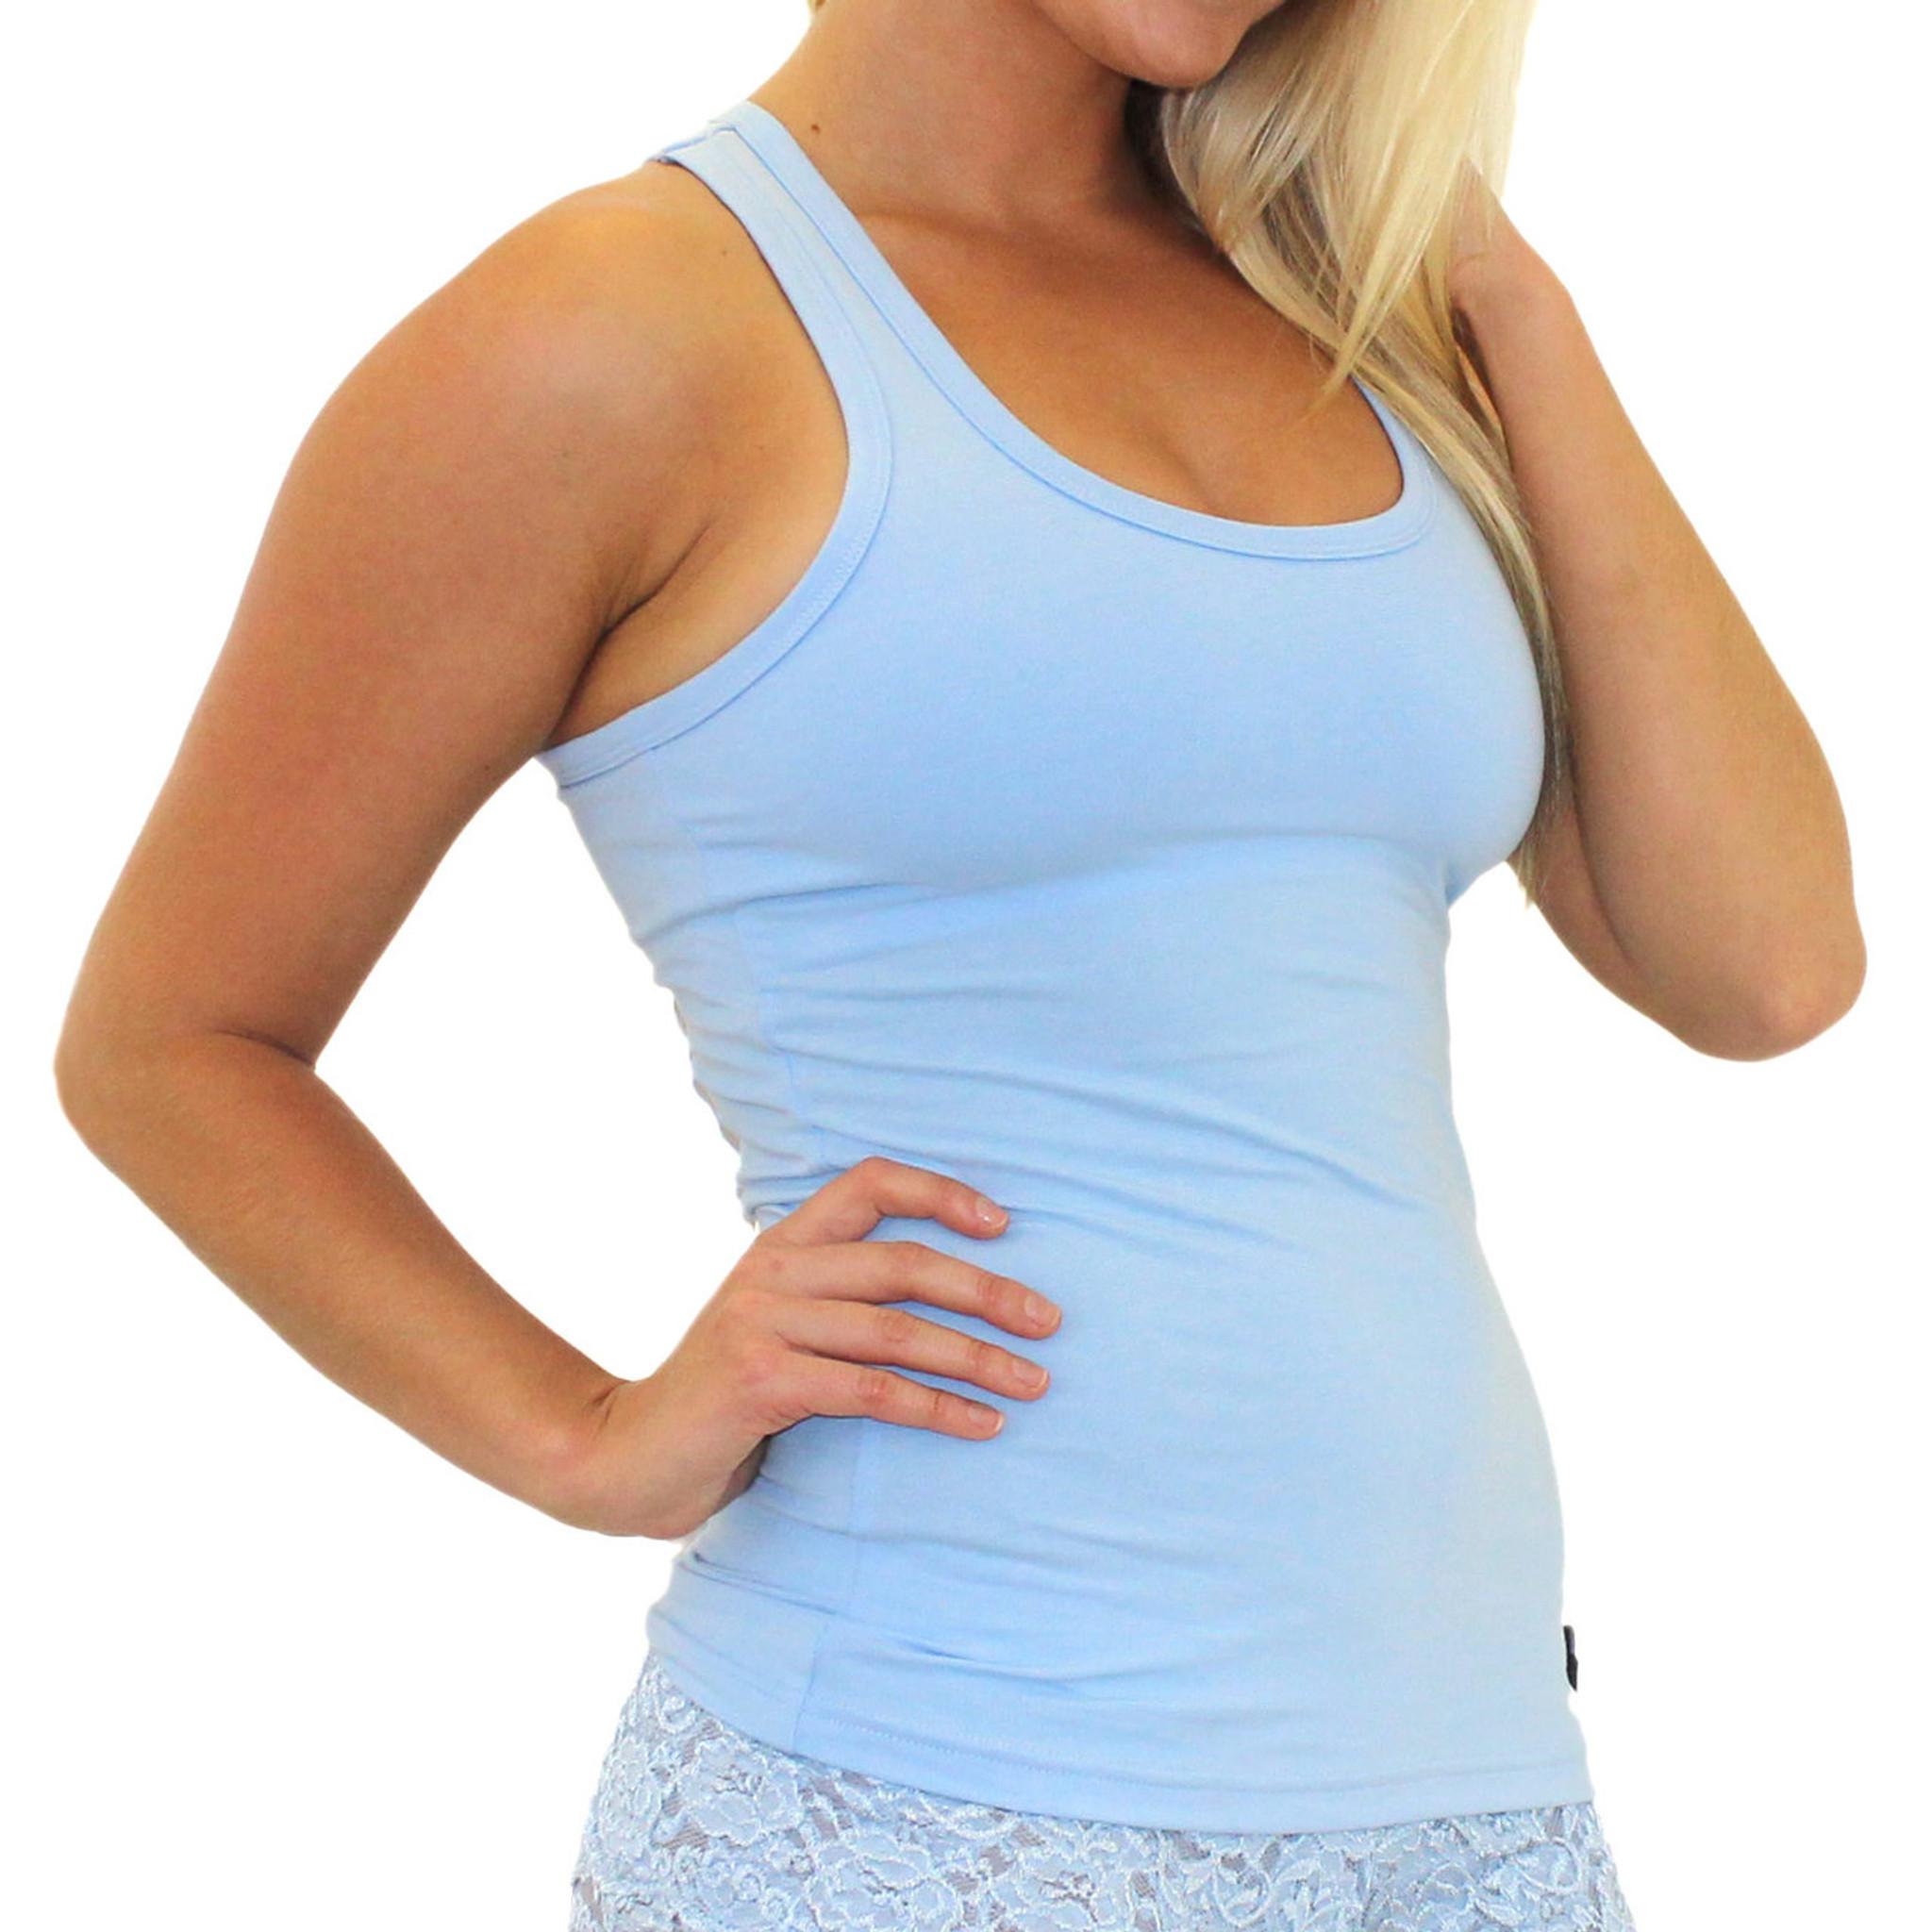 1c2566f390 Women s Light Blue Tank Top Shirt with Shelf Bra ...